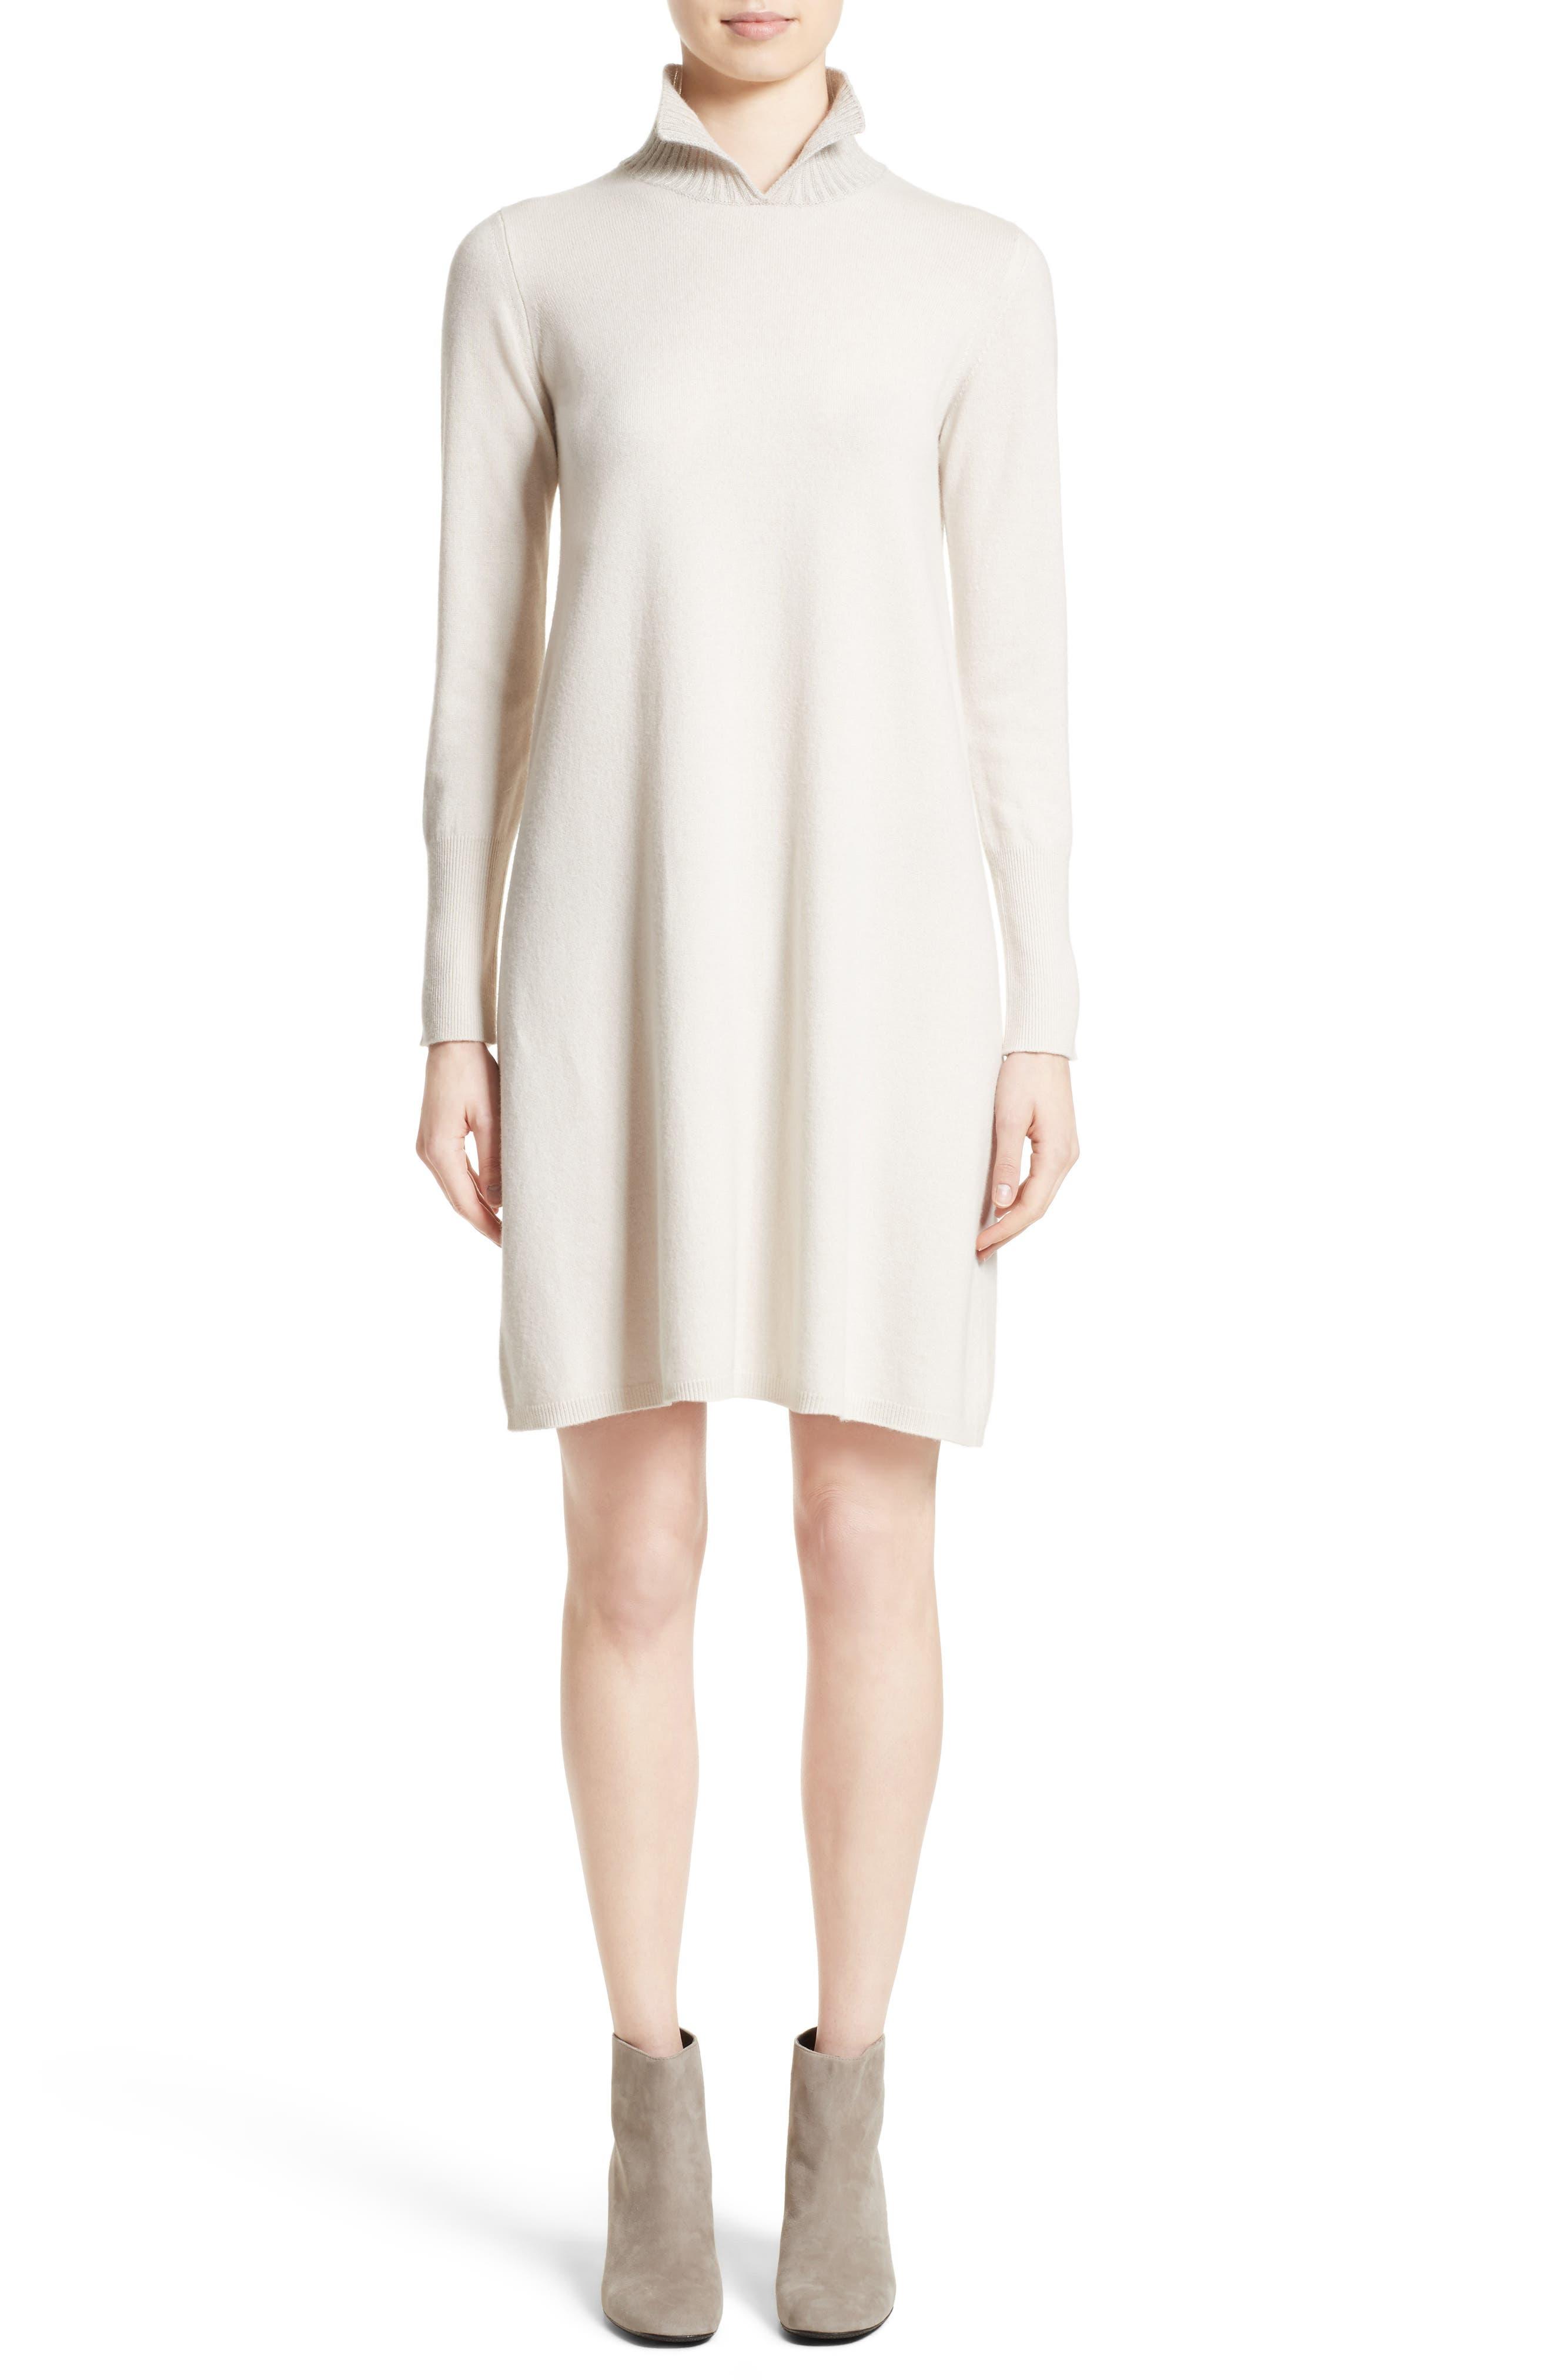 Alternate Image 1 Selected - Fabiana Filippi Wool, Silk & Cashmere Knit Dress